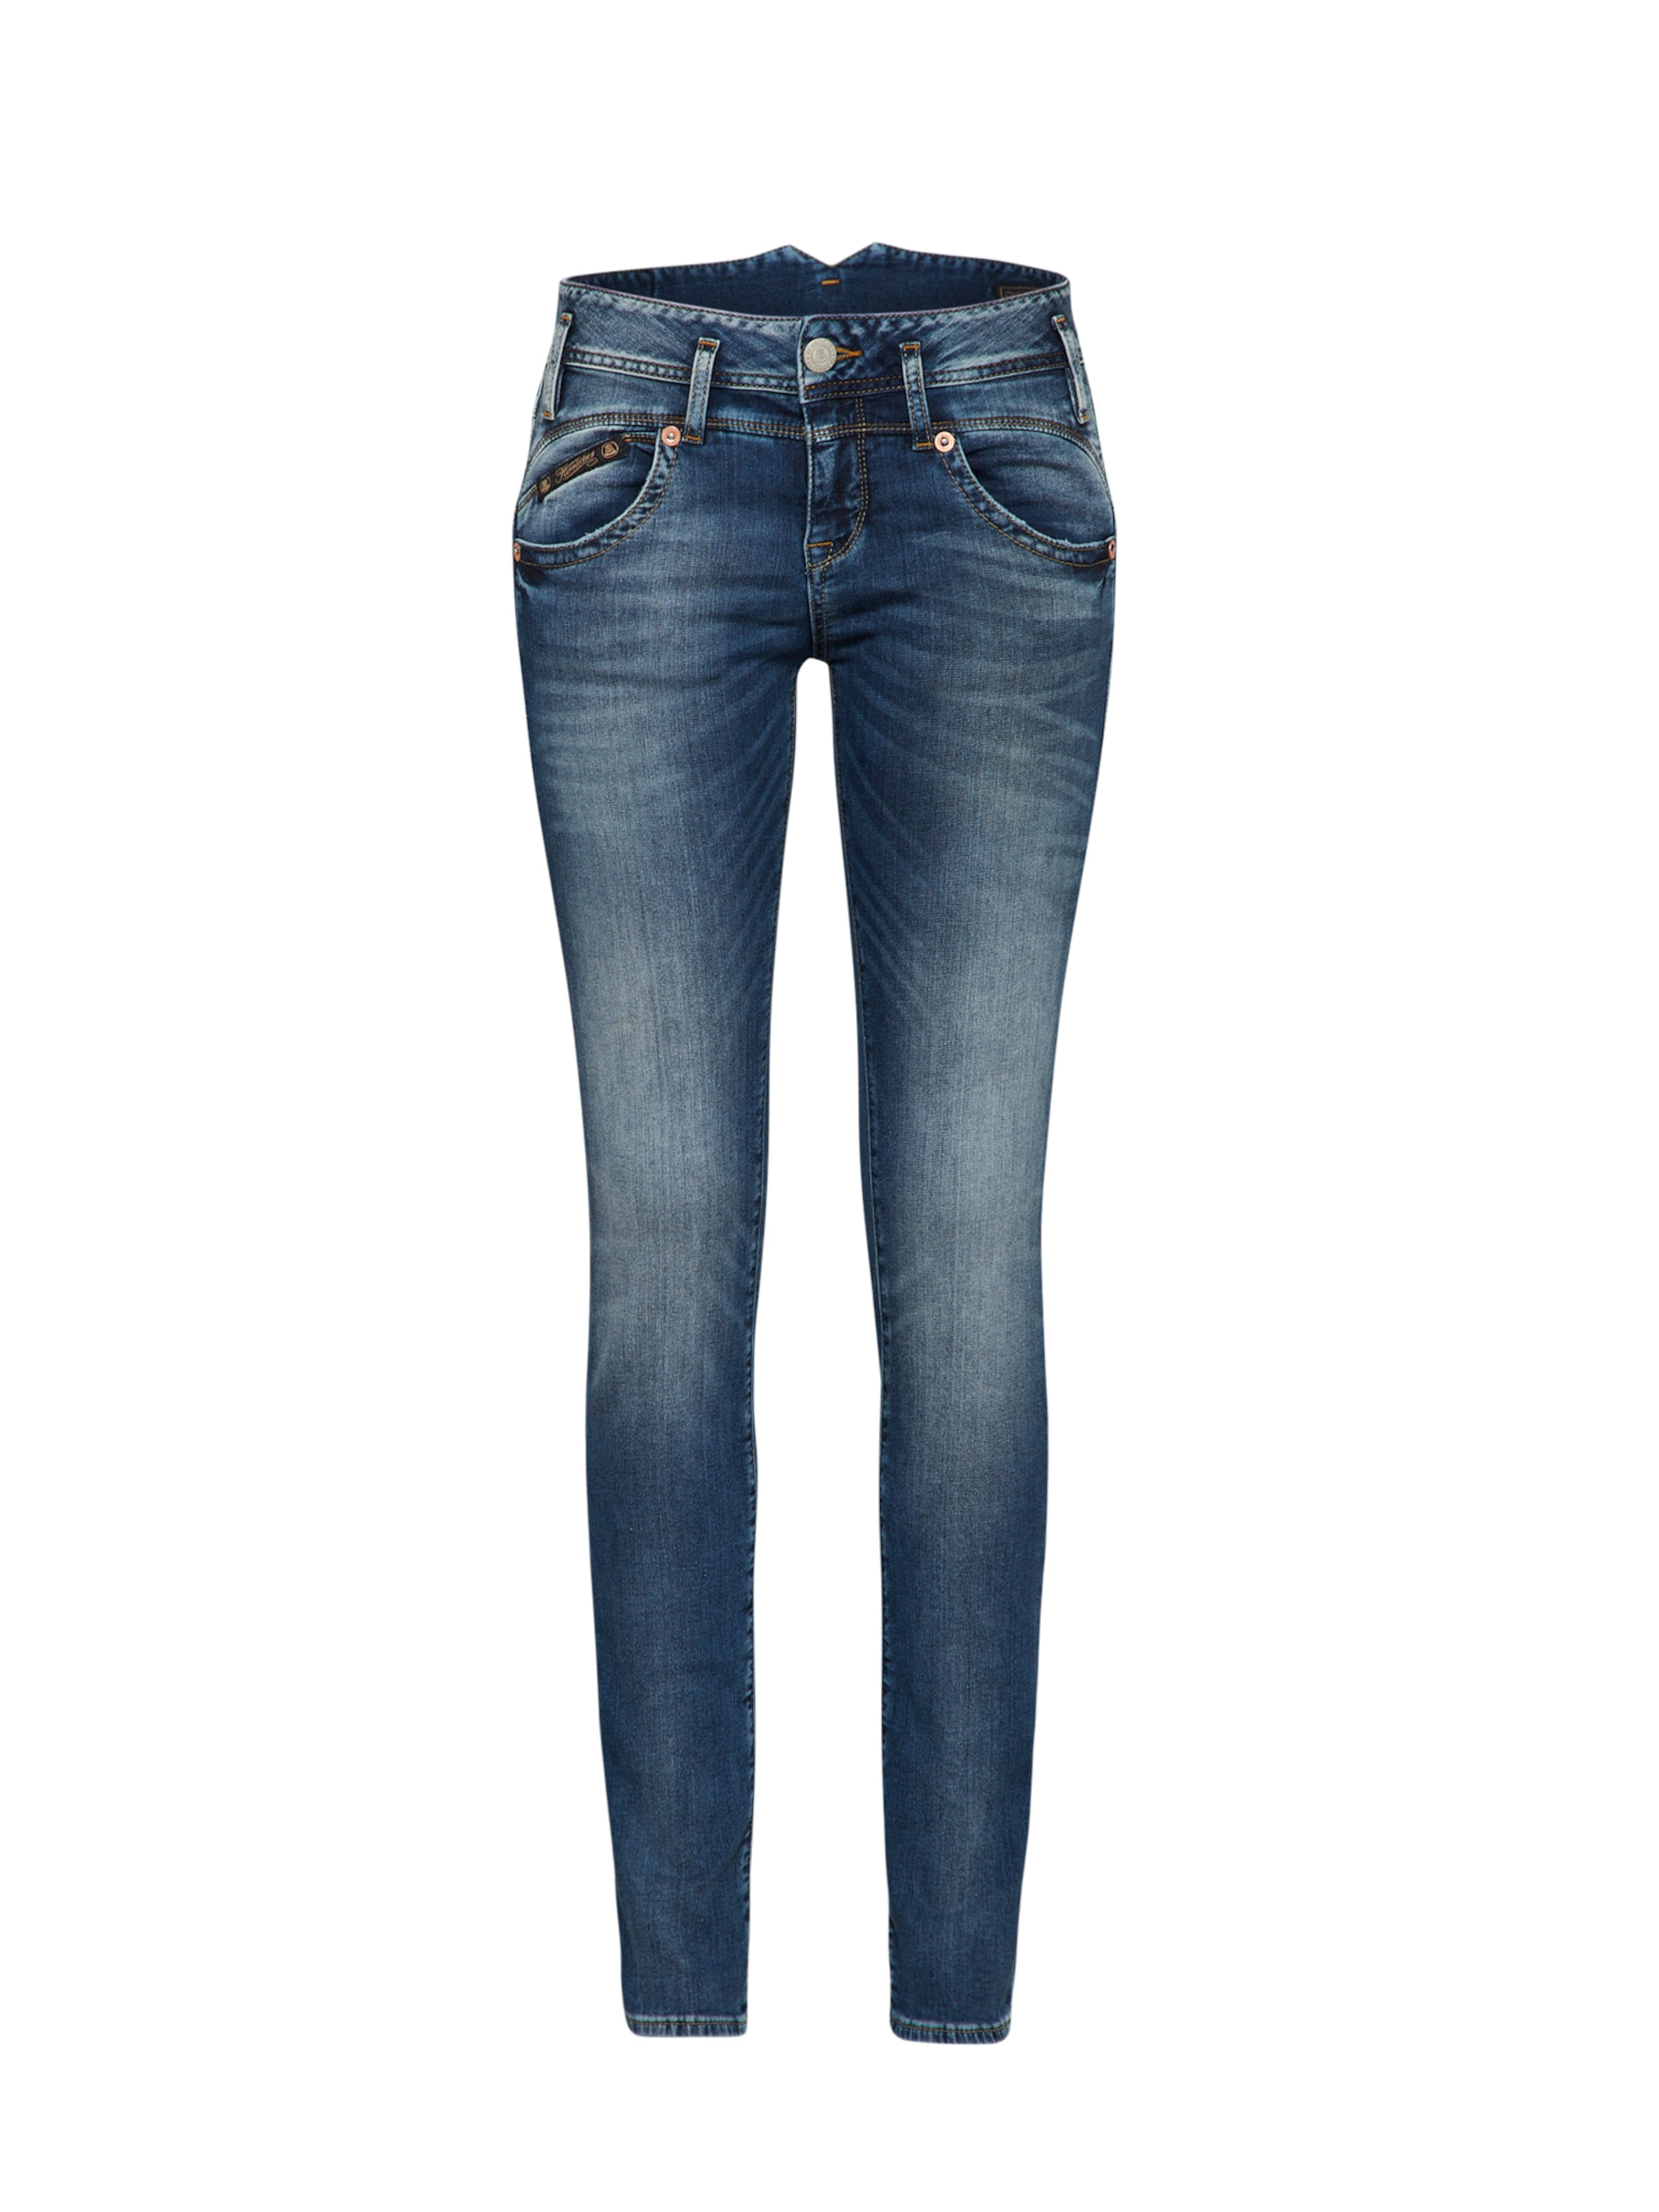 Denim Stretch' Jeans Blue Herrlicher Slim 'pearl In 8N0mvnw